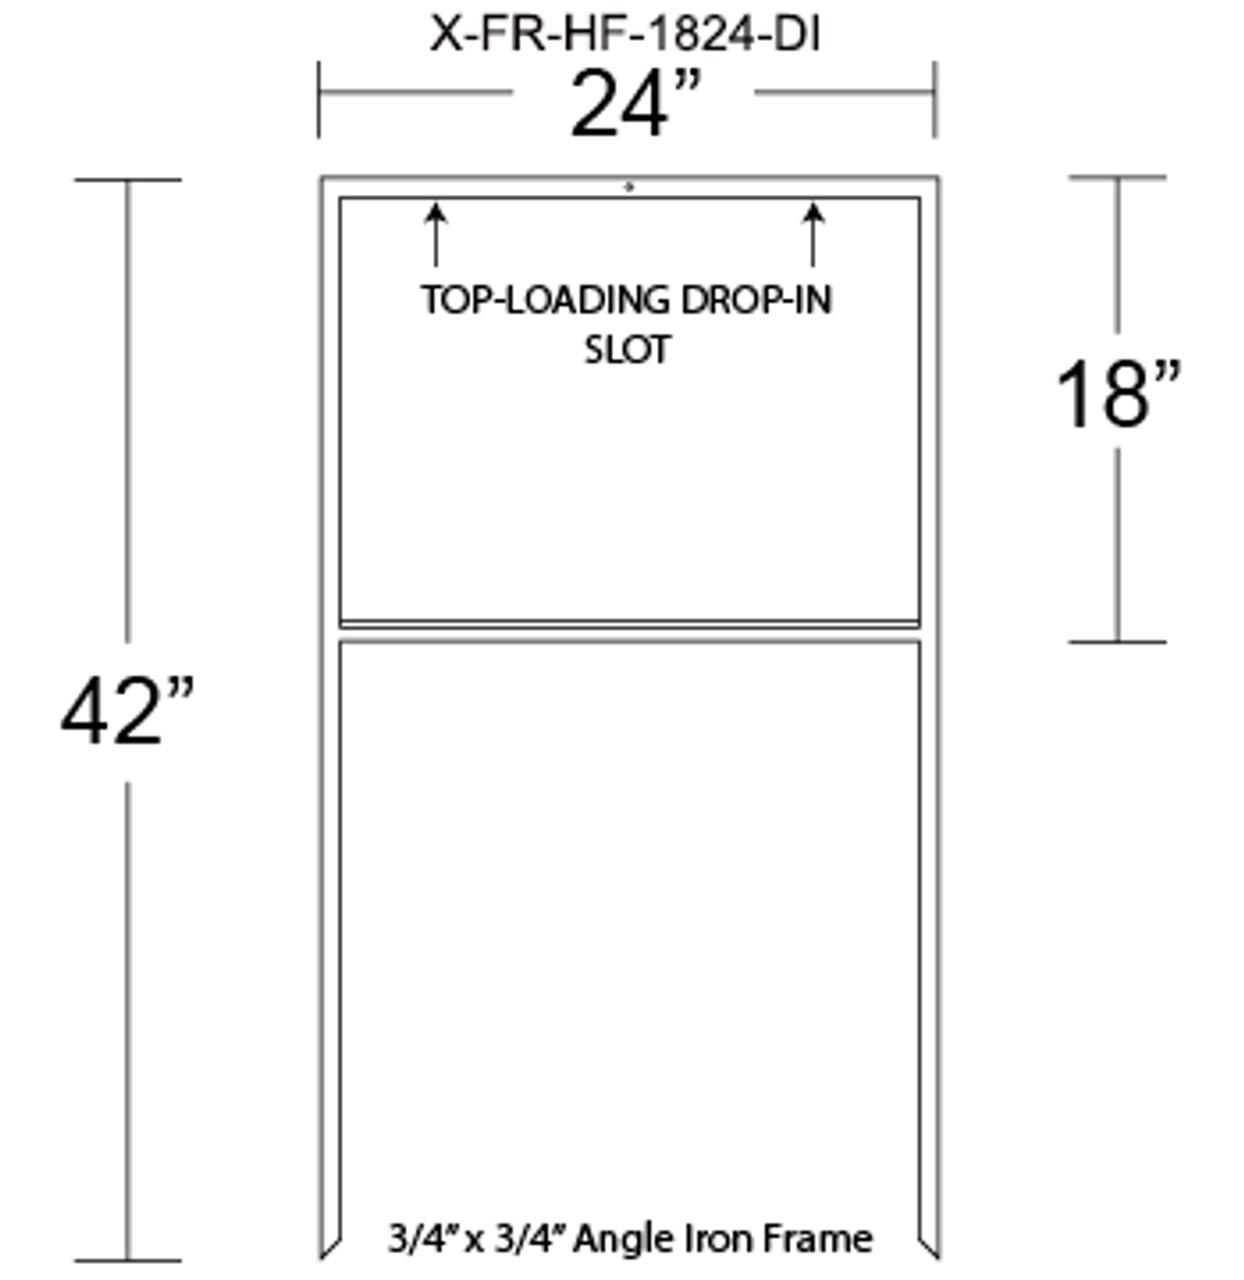 X-FR-HF-1824-DI